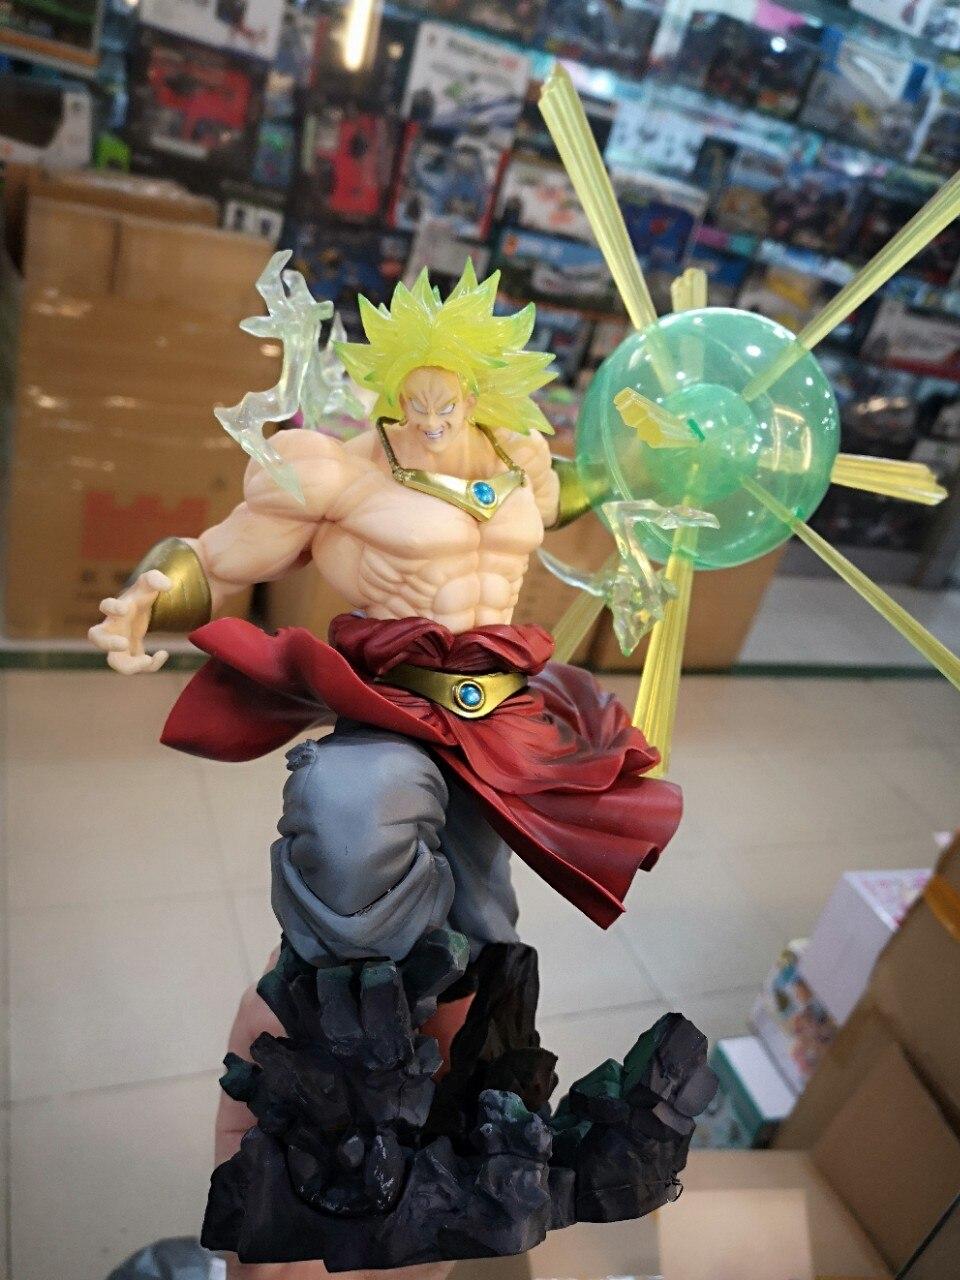 Новые горячие Dragon Ball Z фигурка F. ZERO Супер Saiyan Broli фигурку Broly ПВХ 32 см